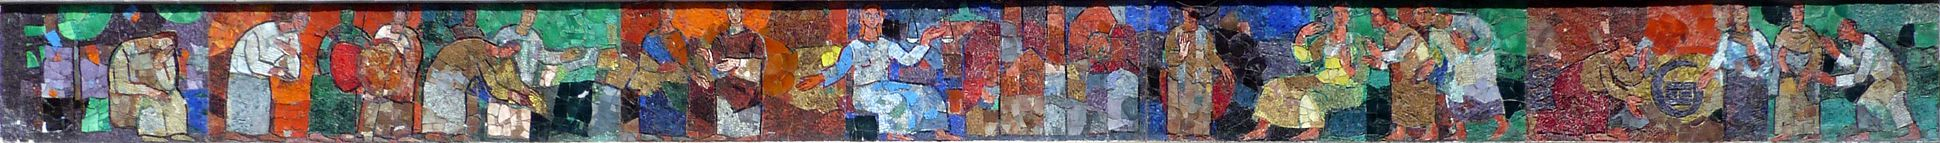 Mosaic on the Main Market (Hauptmarkt) in Nuremberg Mosaic strip of the west side